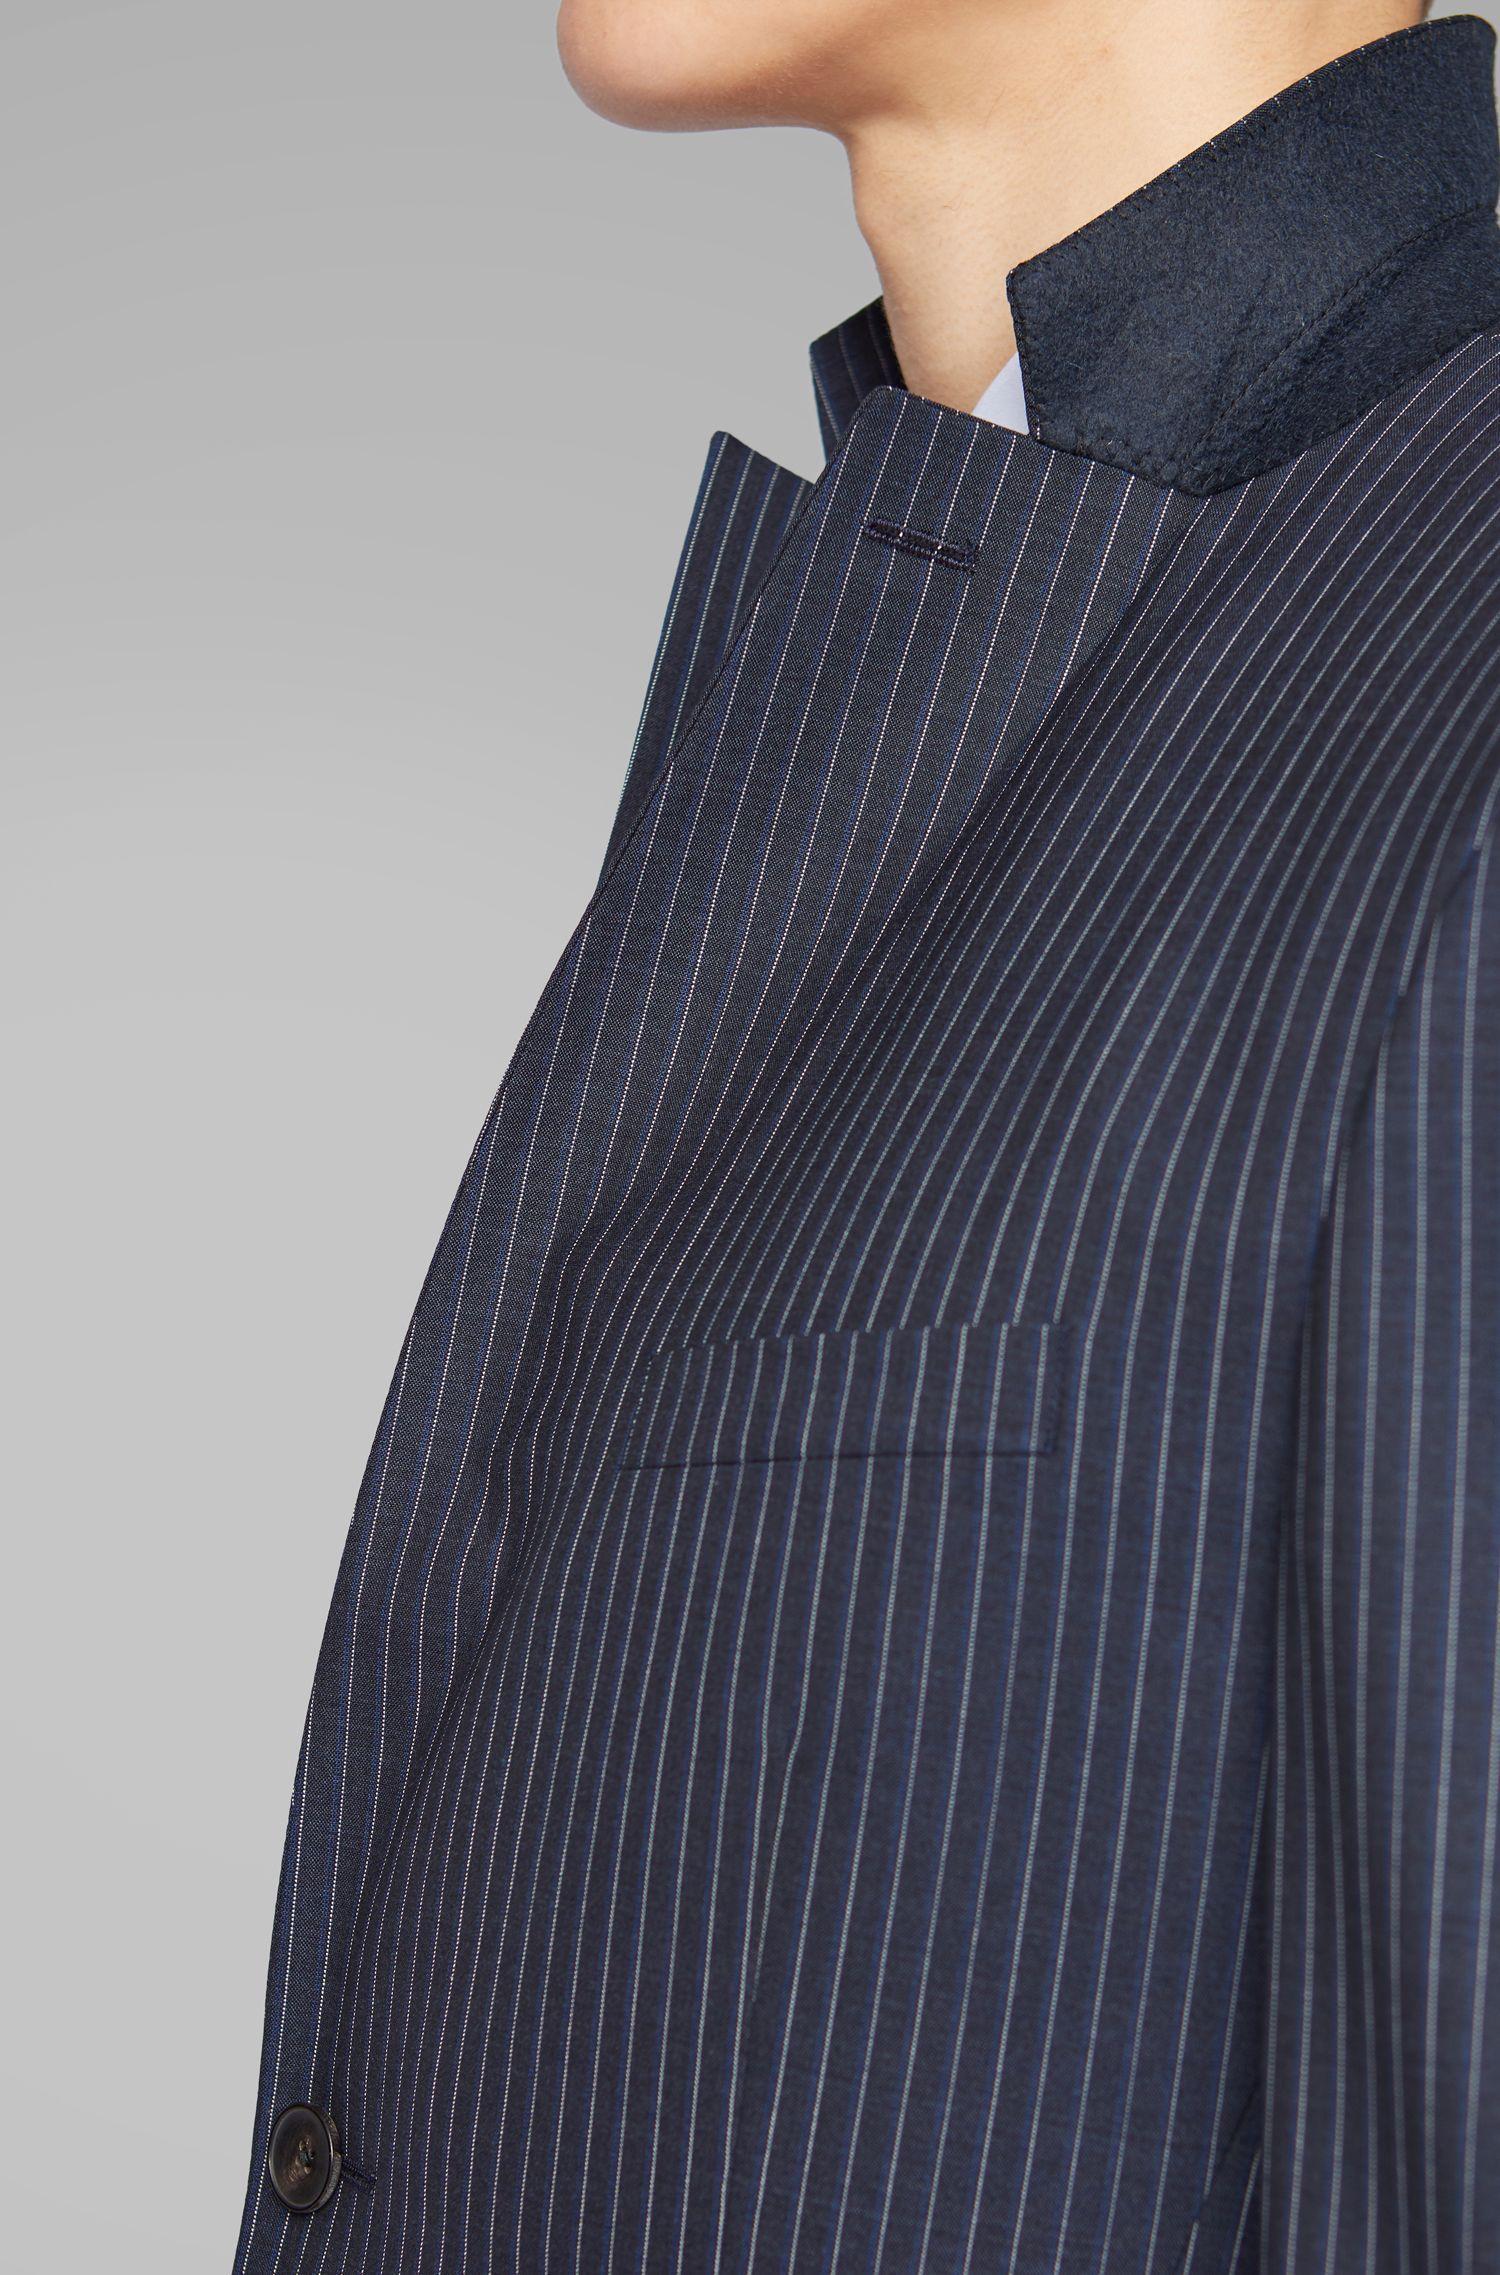 b440450f4 BOSS Extra-slim-fit Pinstripe Suit In Virgin Wool in Blue for Men - Lyst